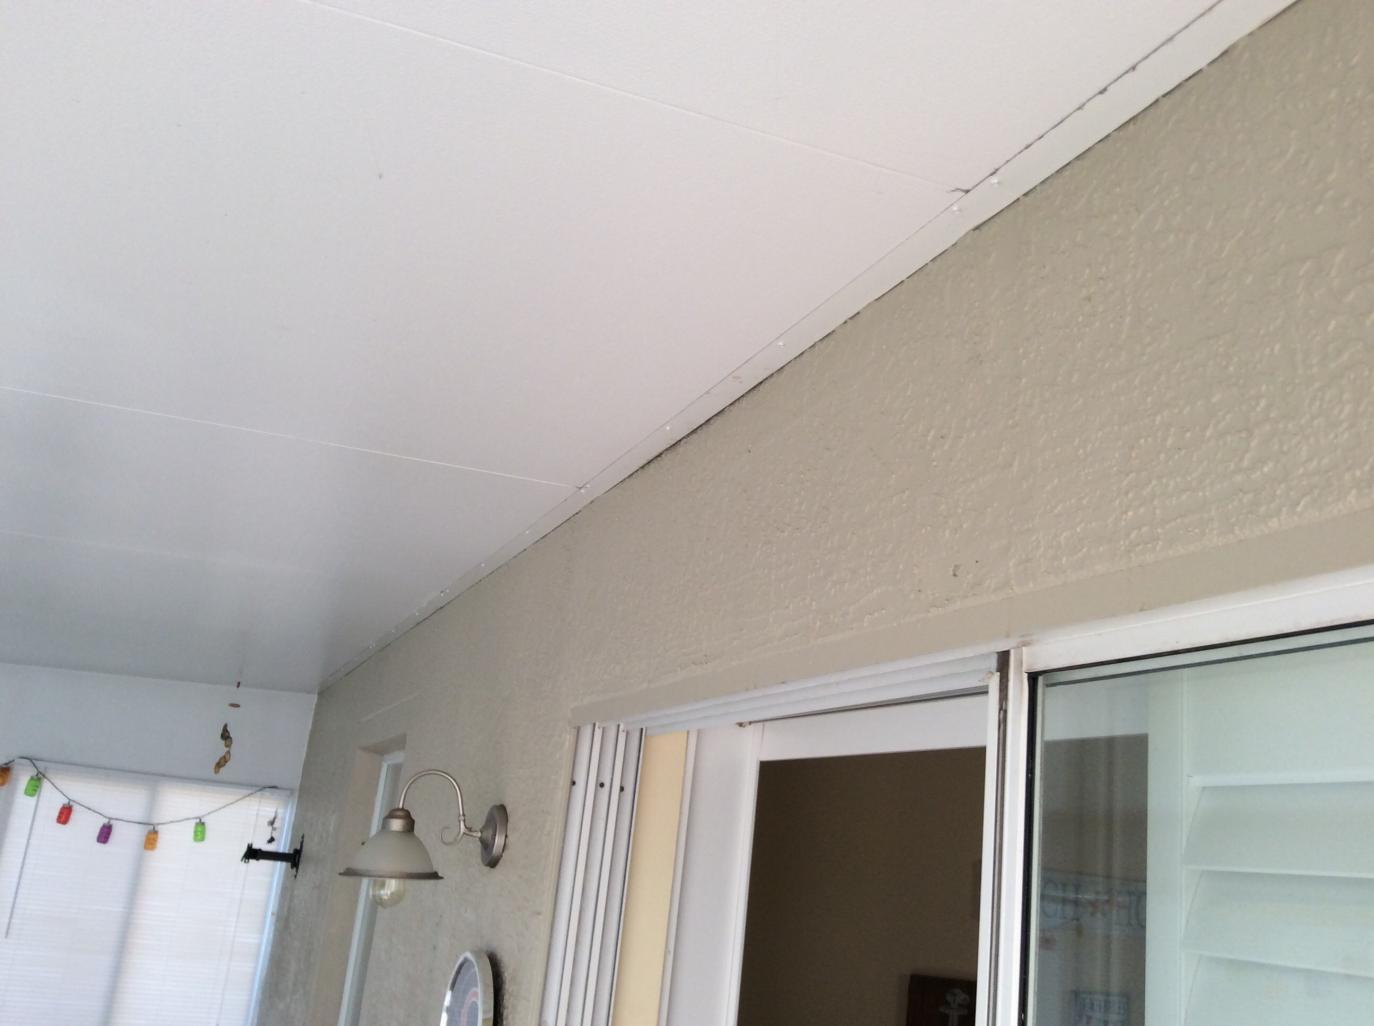 Florida Room Leaking Along Edge Where It Meets House